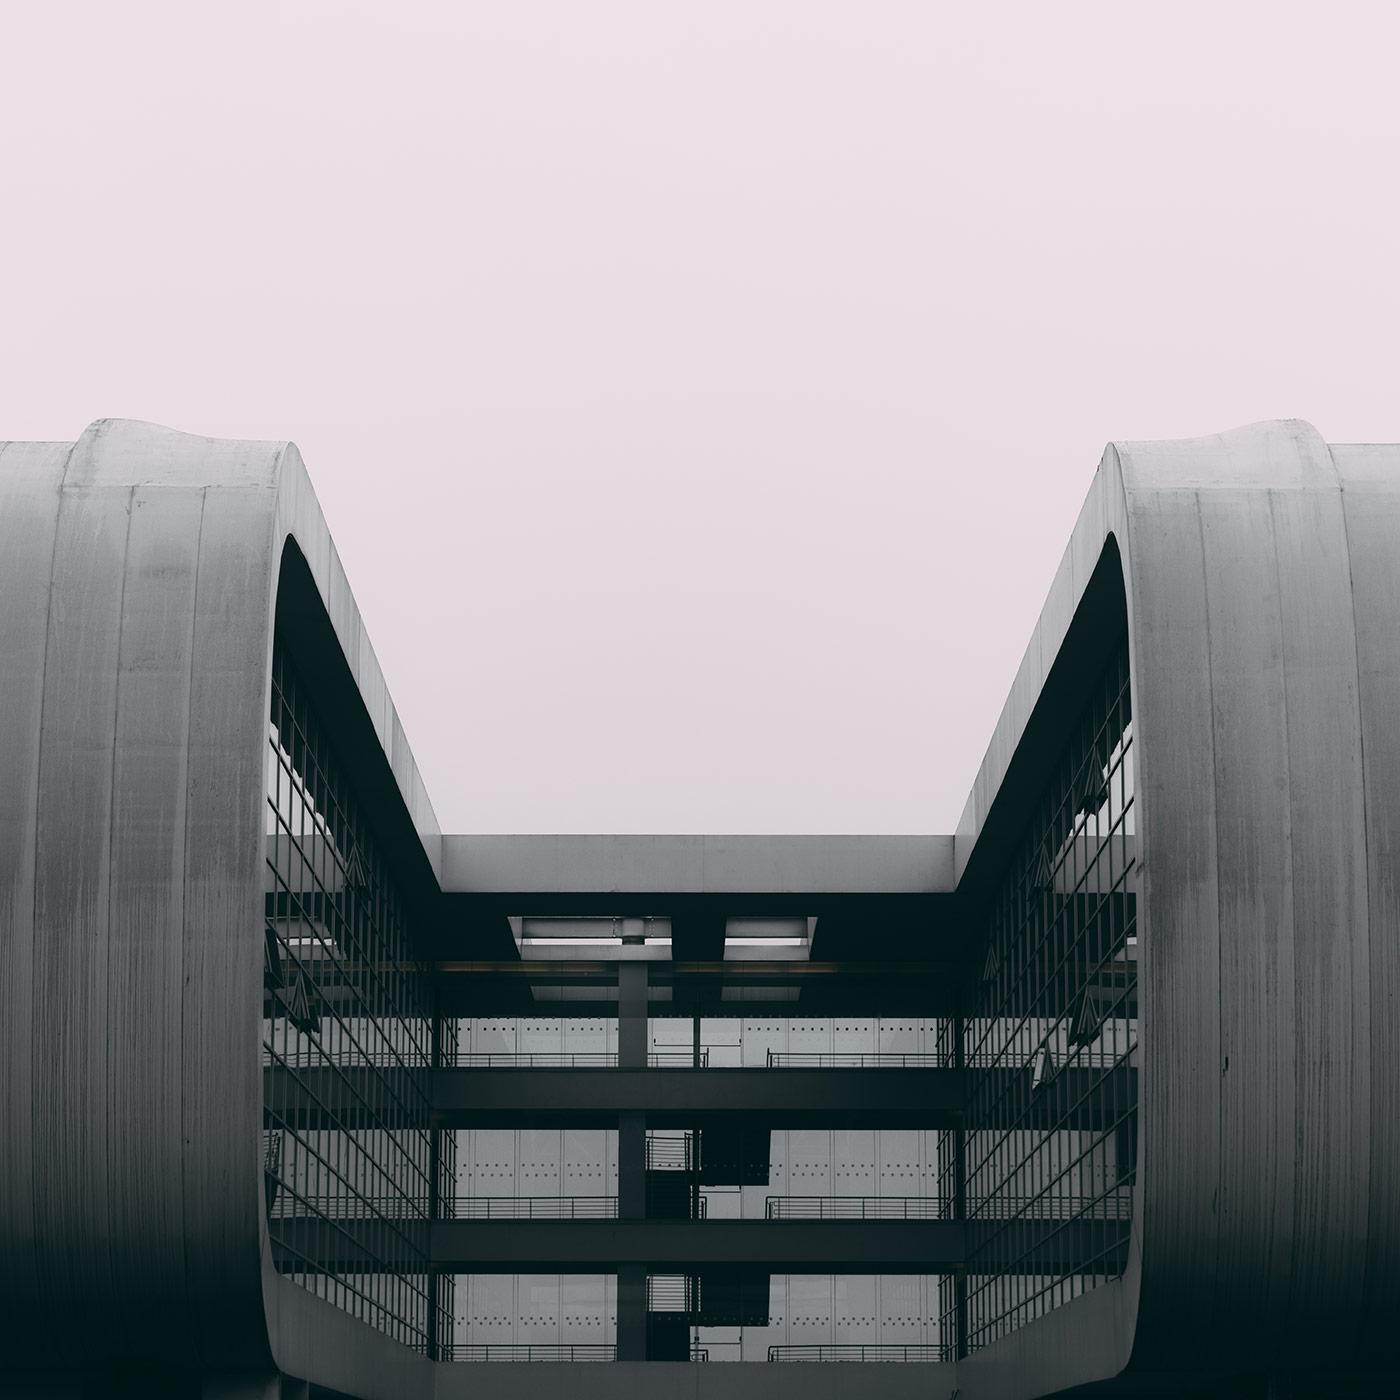 sebastian-weiss-monolicious-07